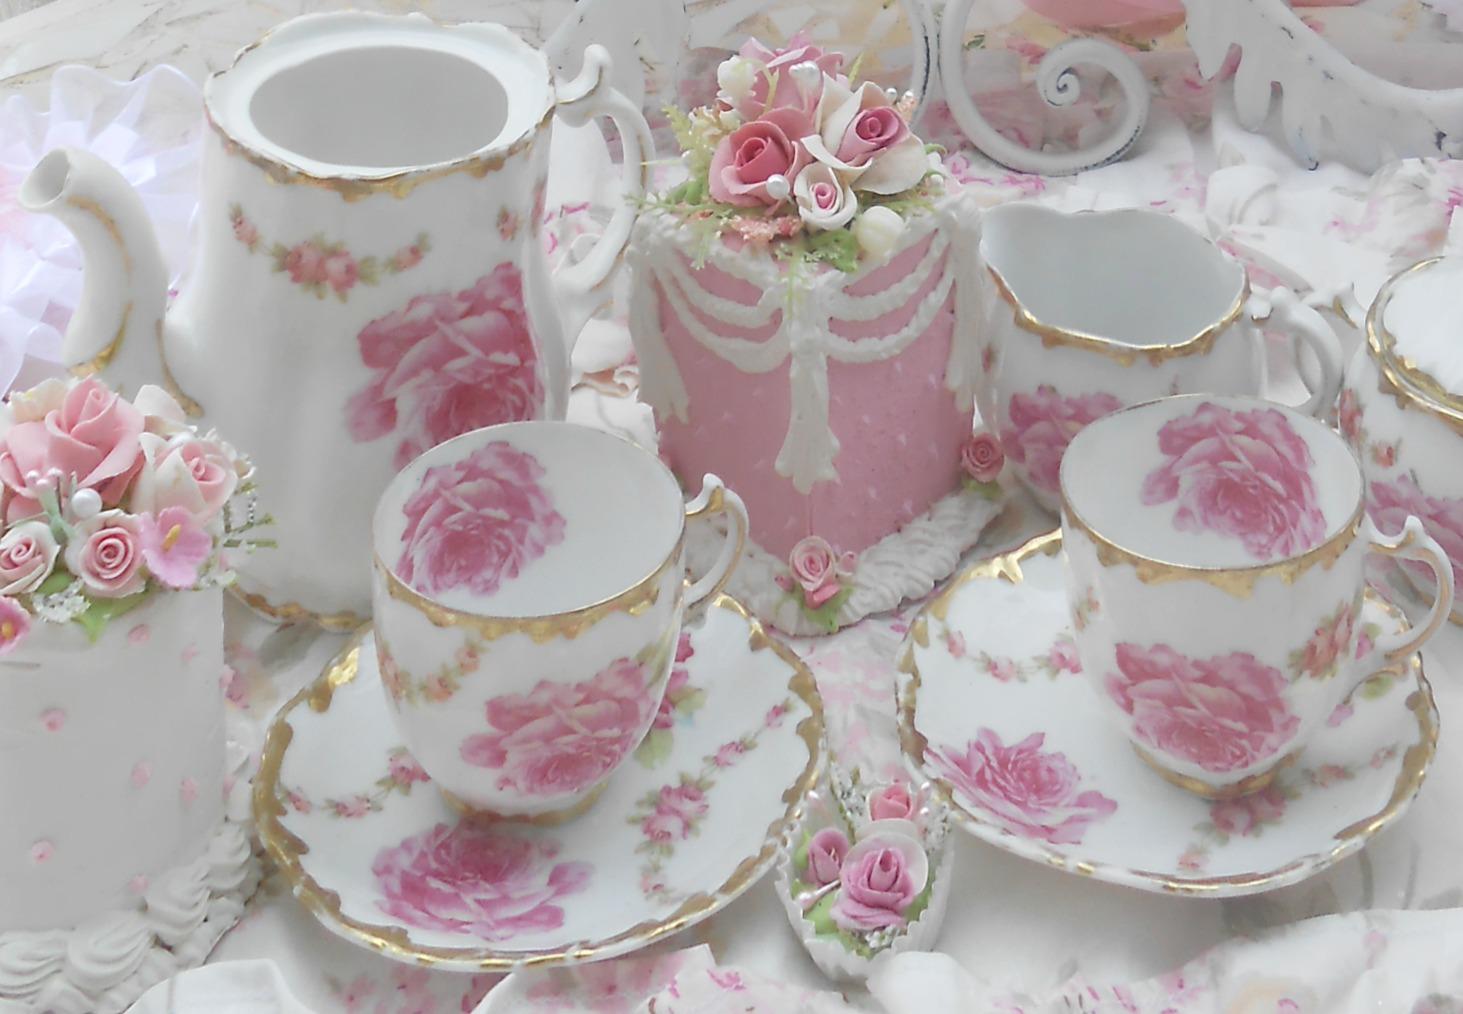 Teaparty: Olivia's Romantic Home: Rose Garden Tea Party